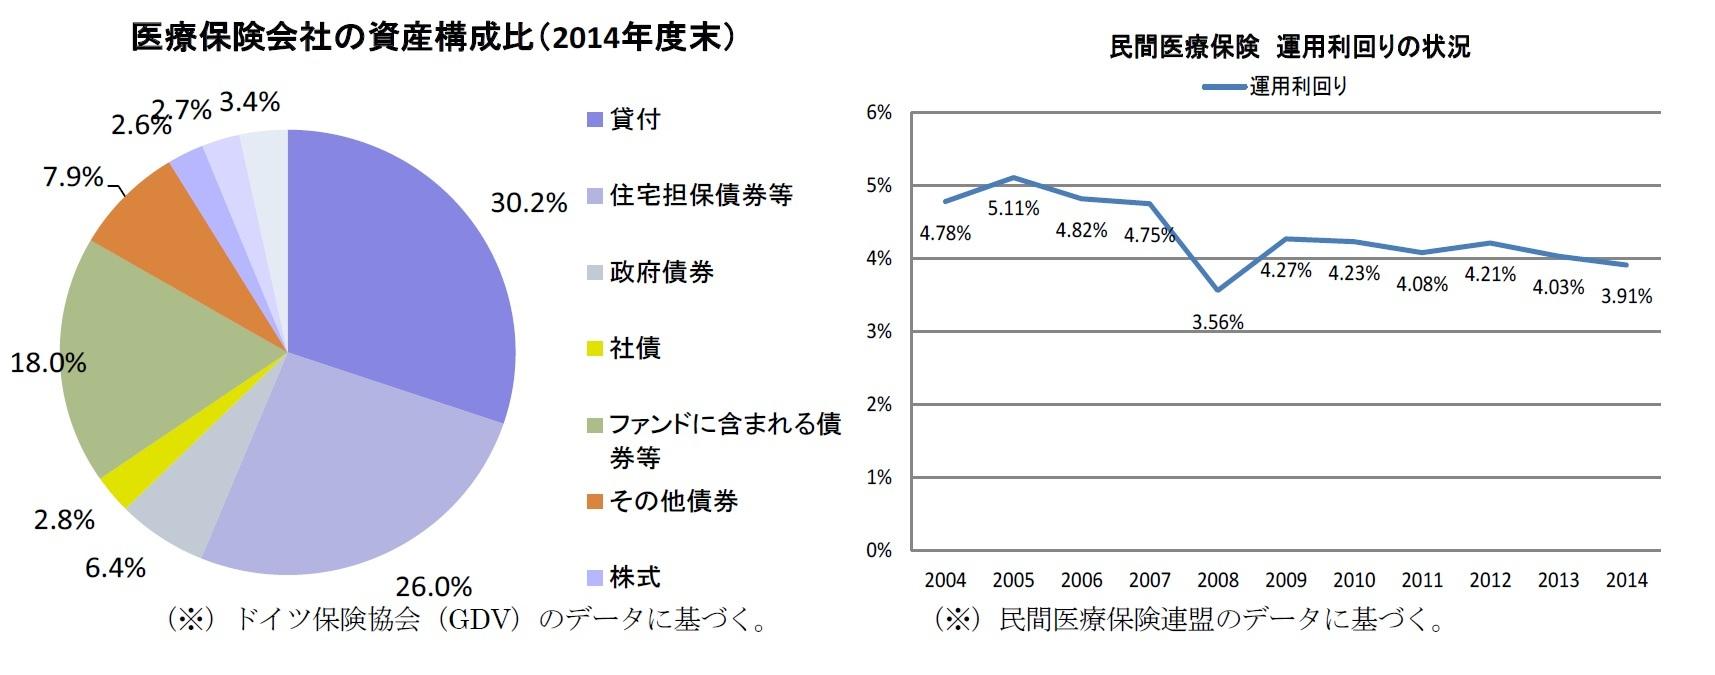 医療保険会社の資産構成比(2014年度末)/民間医療保険運用利回りの状況